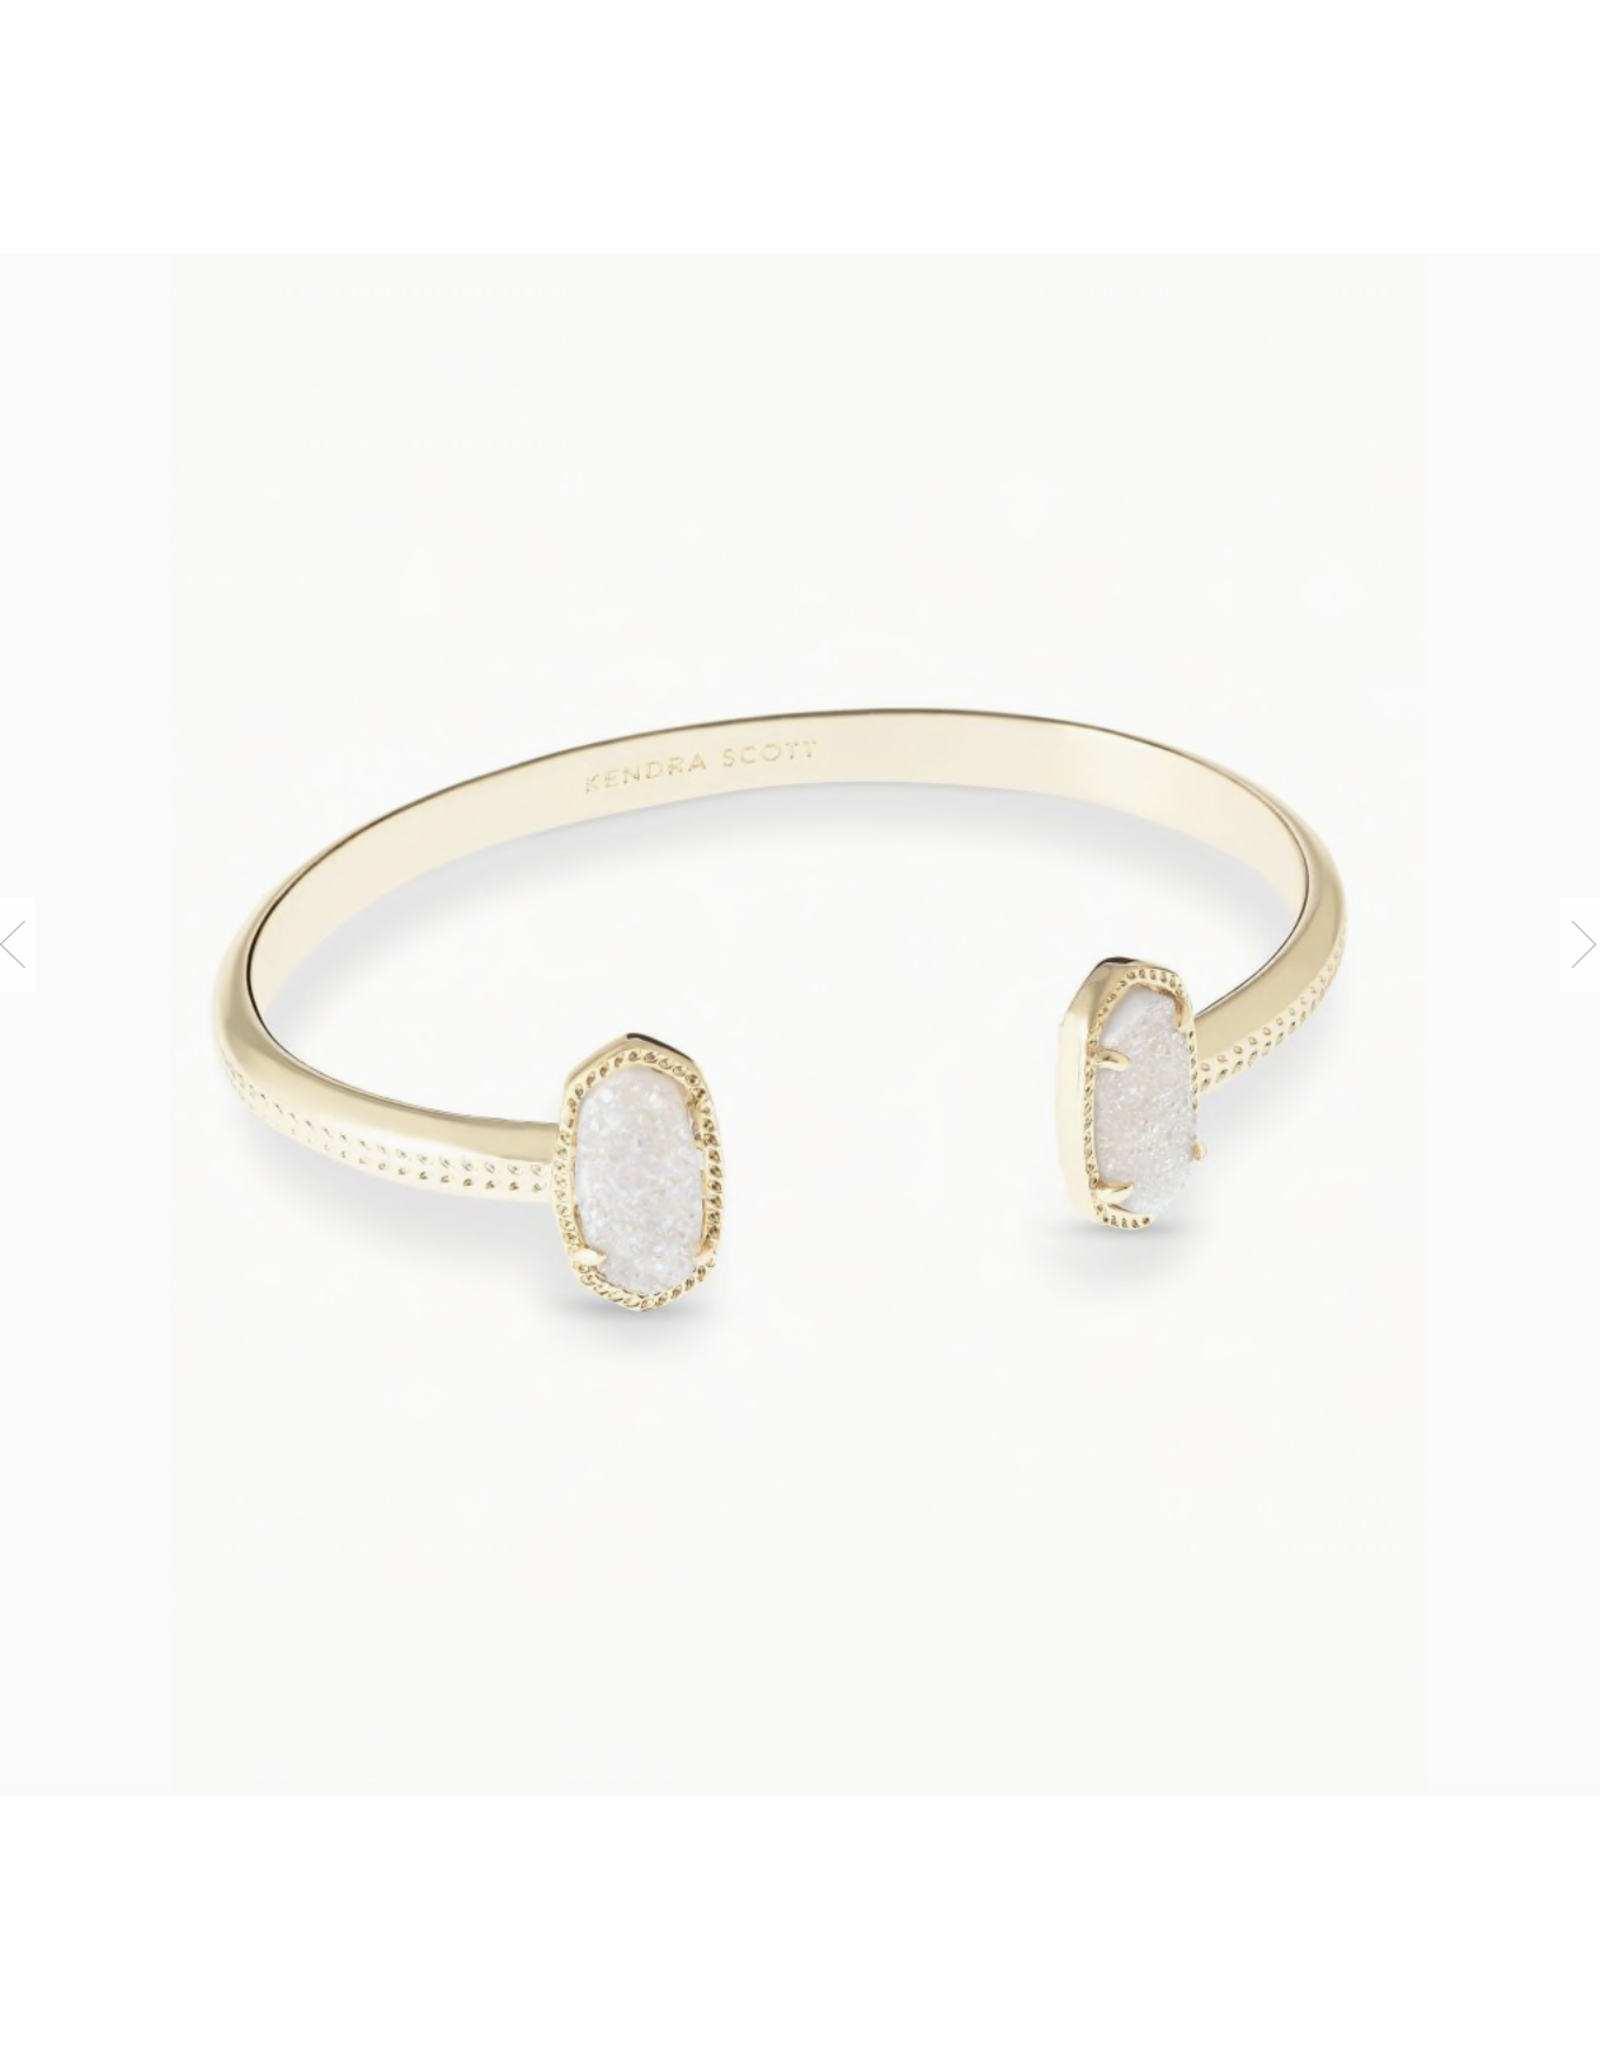 Kendra Scott Bracelet Elton Gold Iridescent Drusy